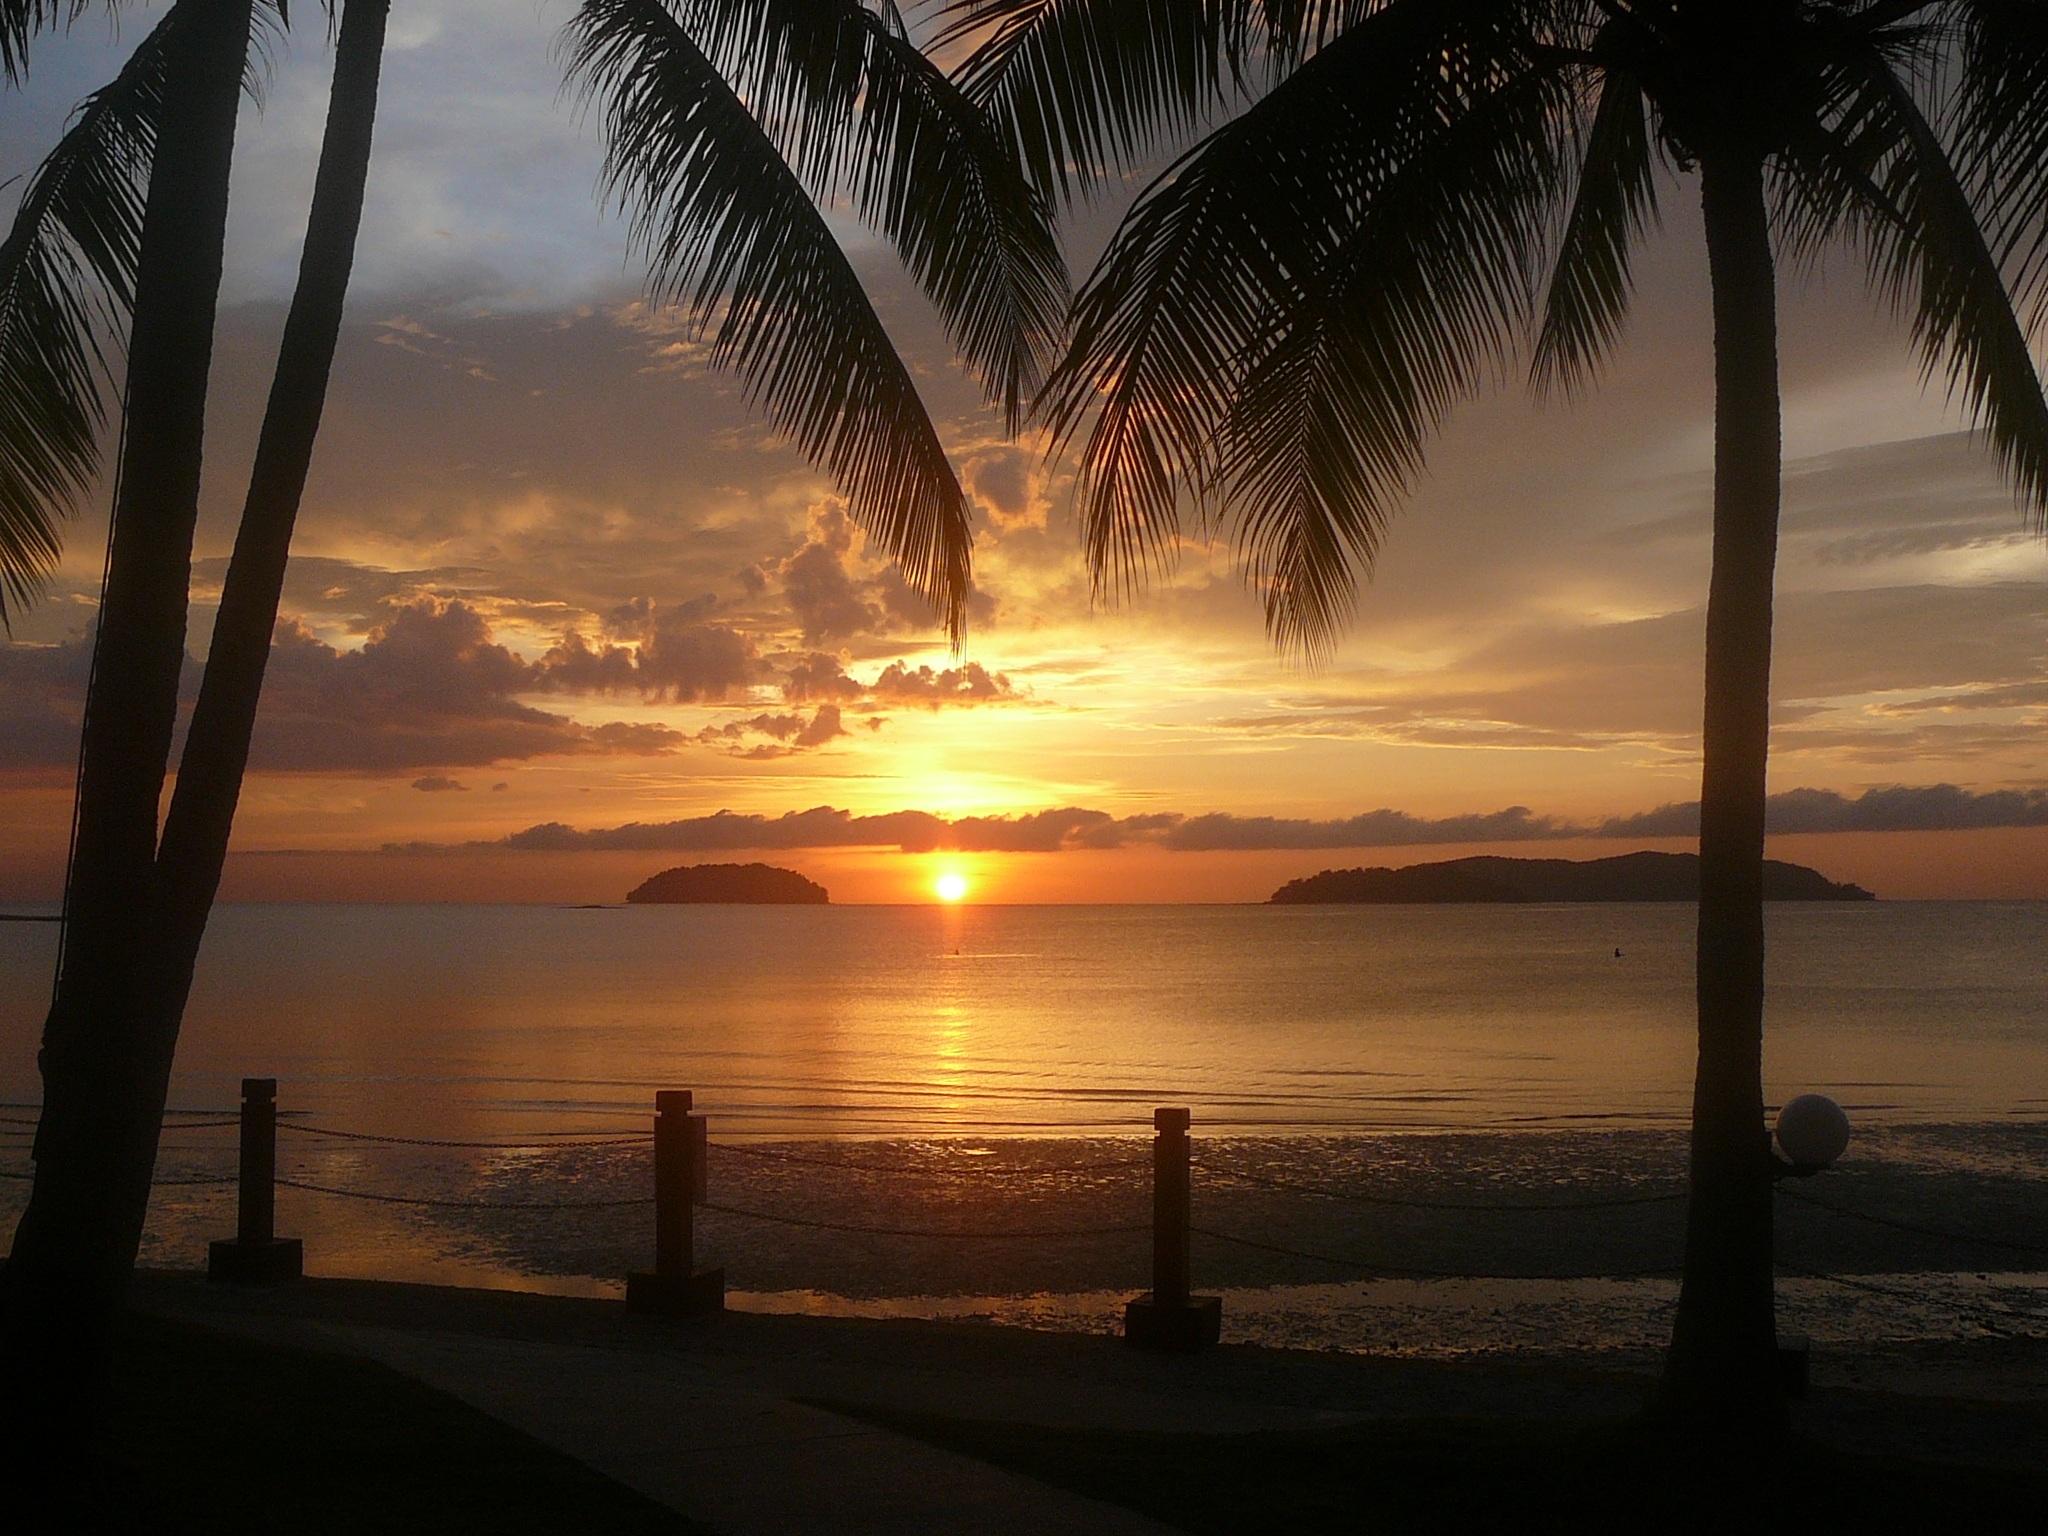 sunset-670099